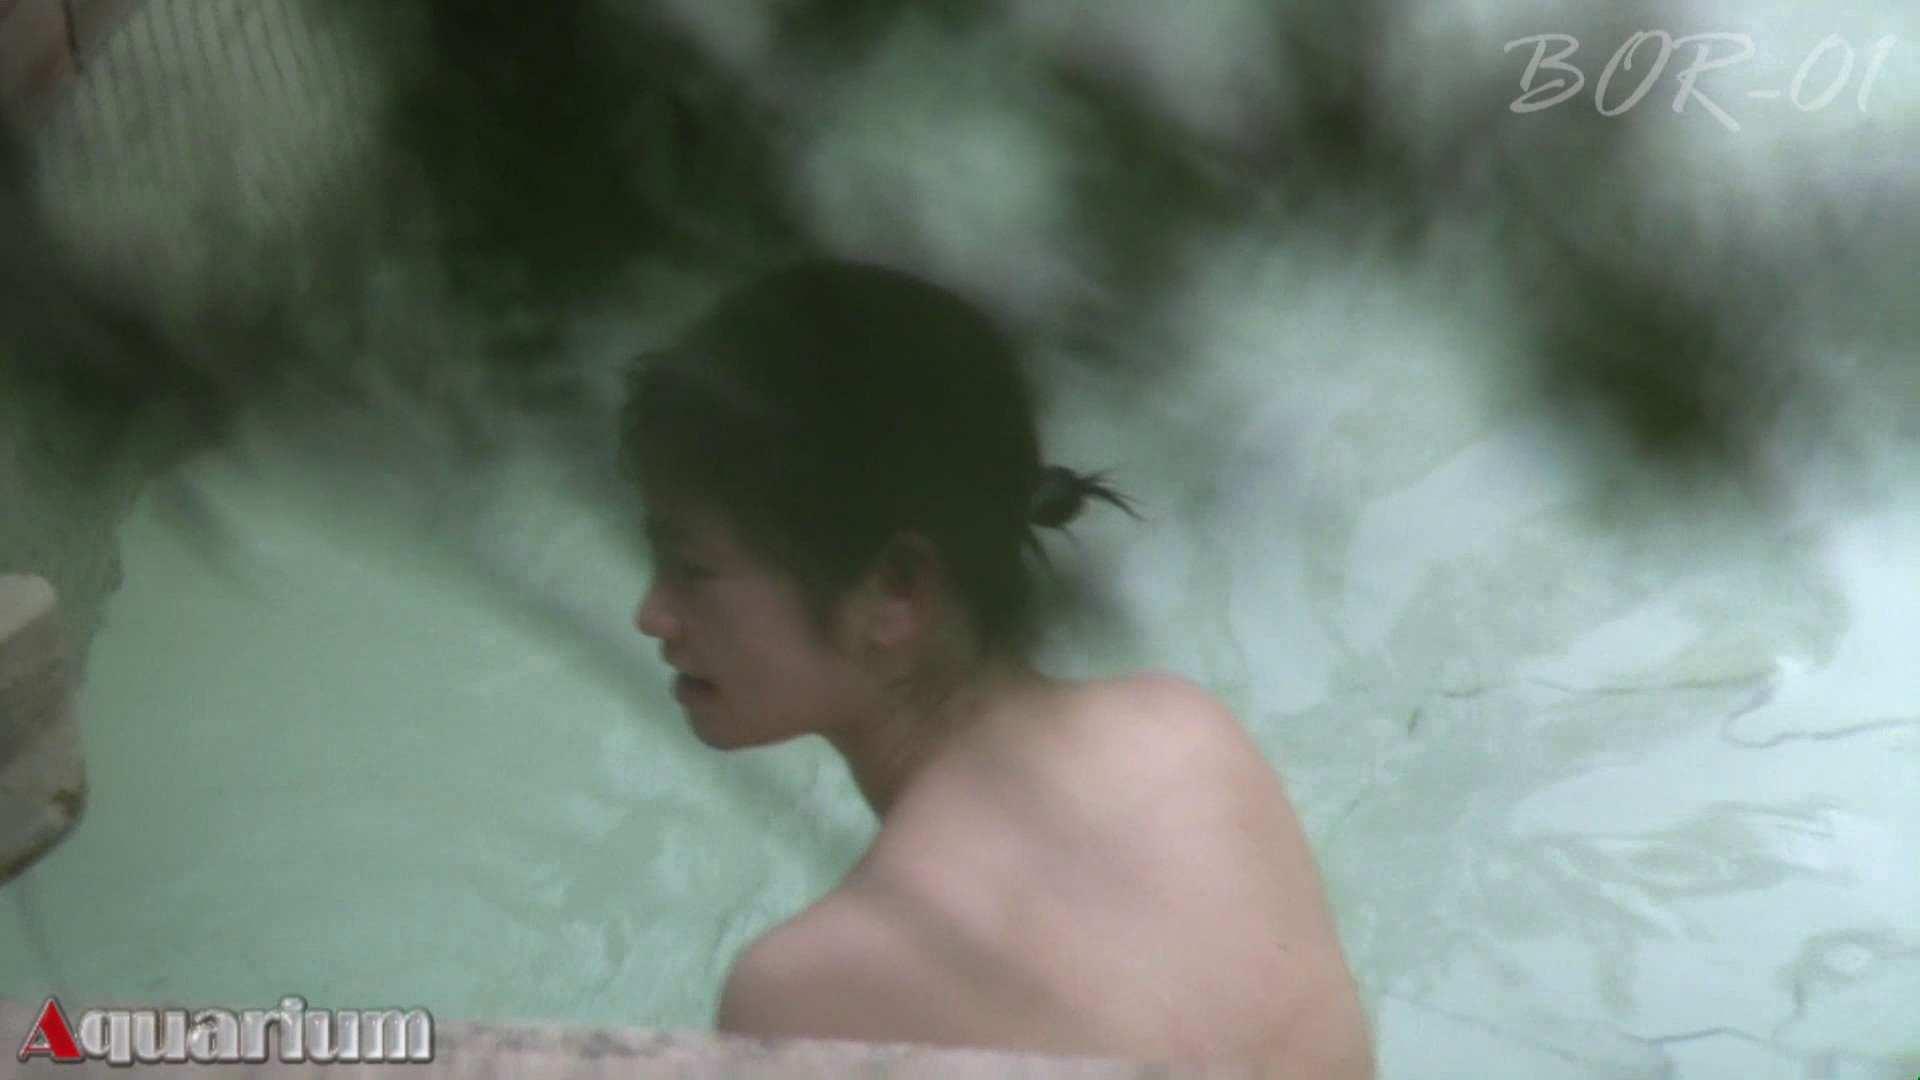 Aquaな露天風呂Vol.465 美しいOLの裸体 おめこ無修正動画無料 103pic 83